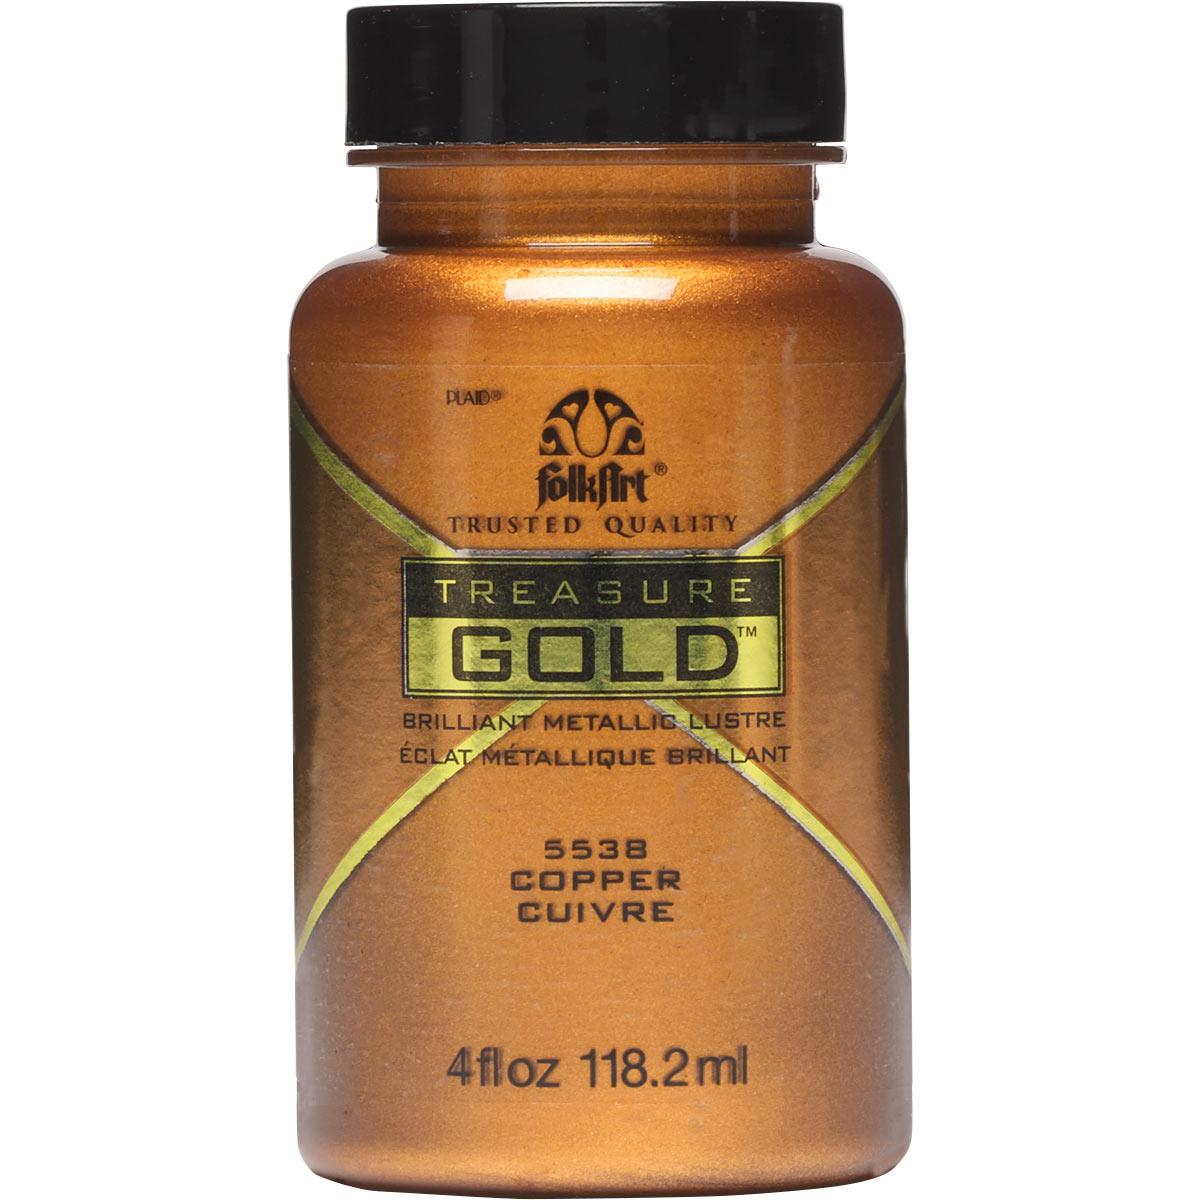 FolkArt ® Treasure Gold™ - Copper, 4 oz.